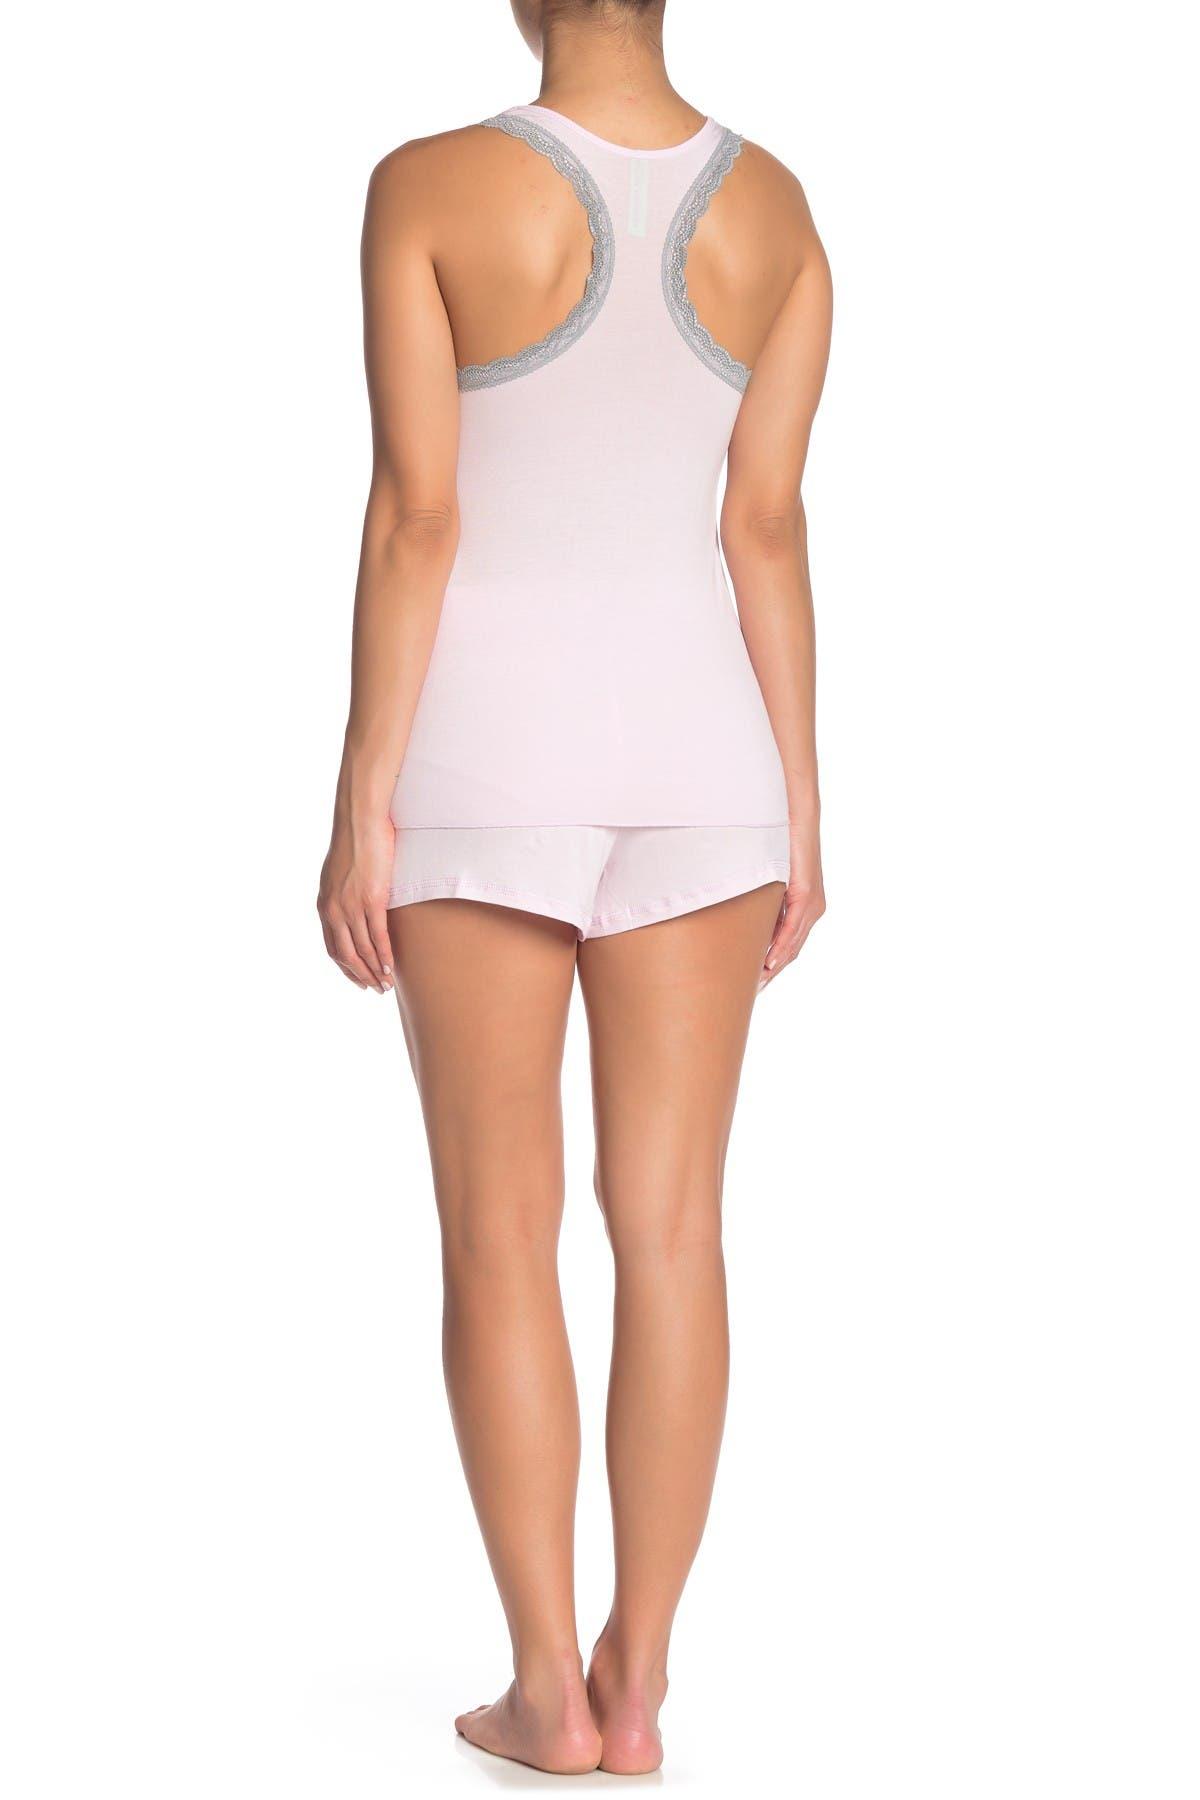 Honeydew Intimates All American Racerback Tank & Shorts 2-Piece Pajama Set